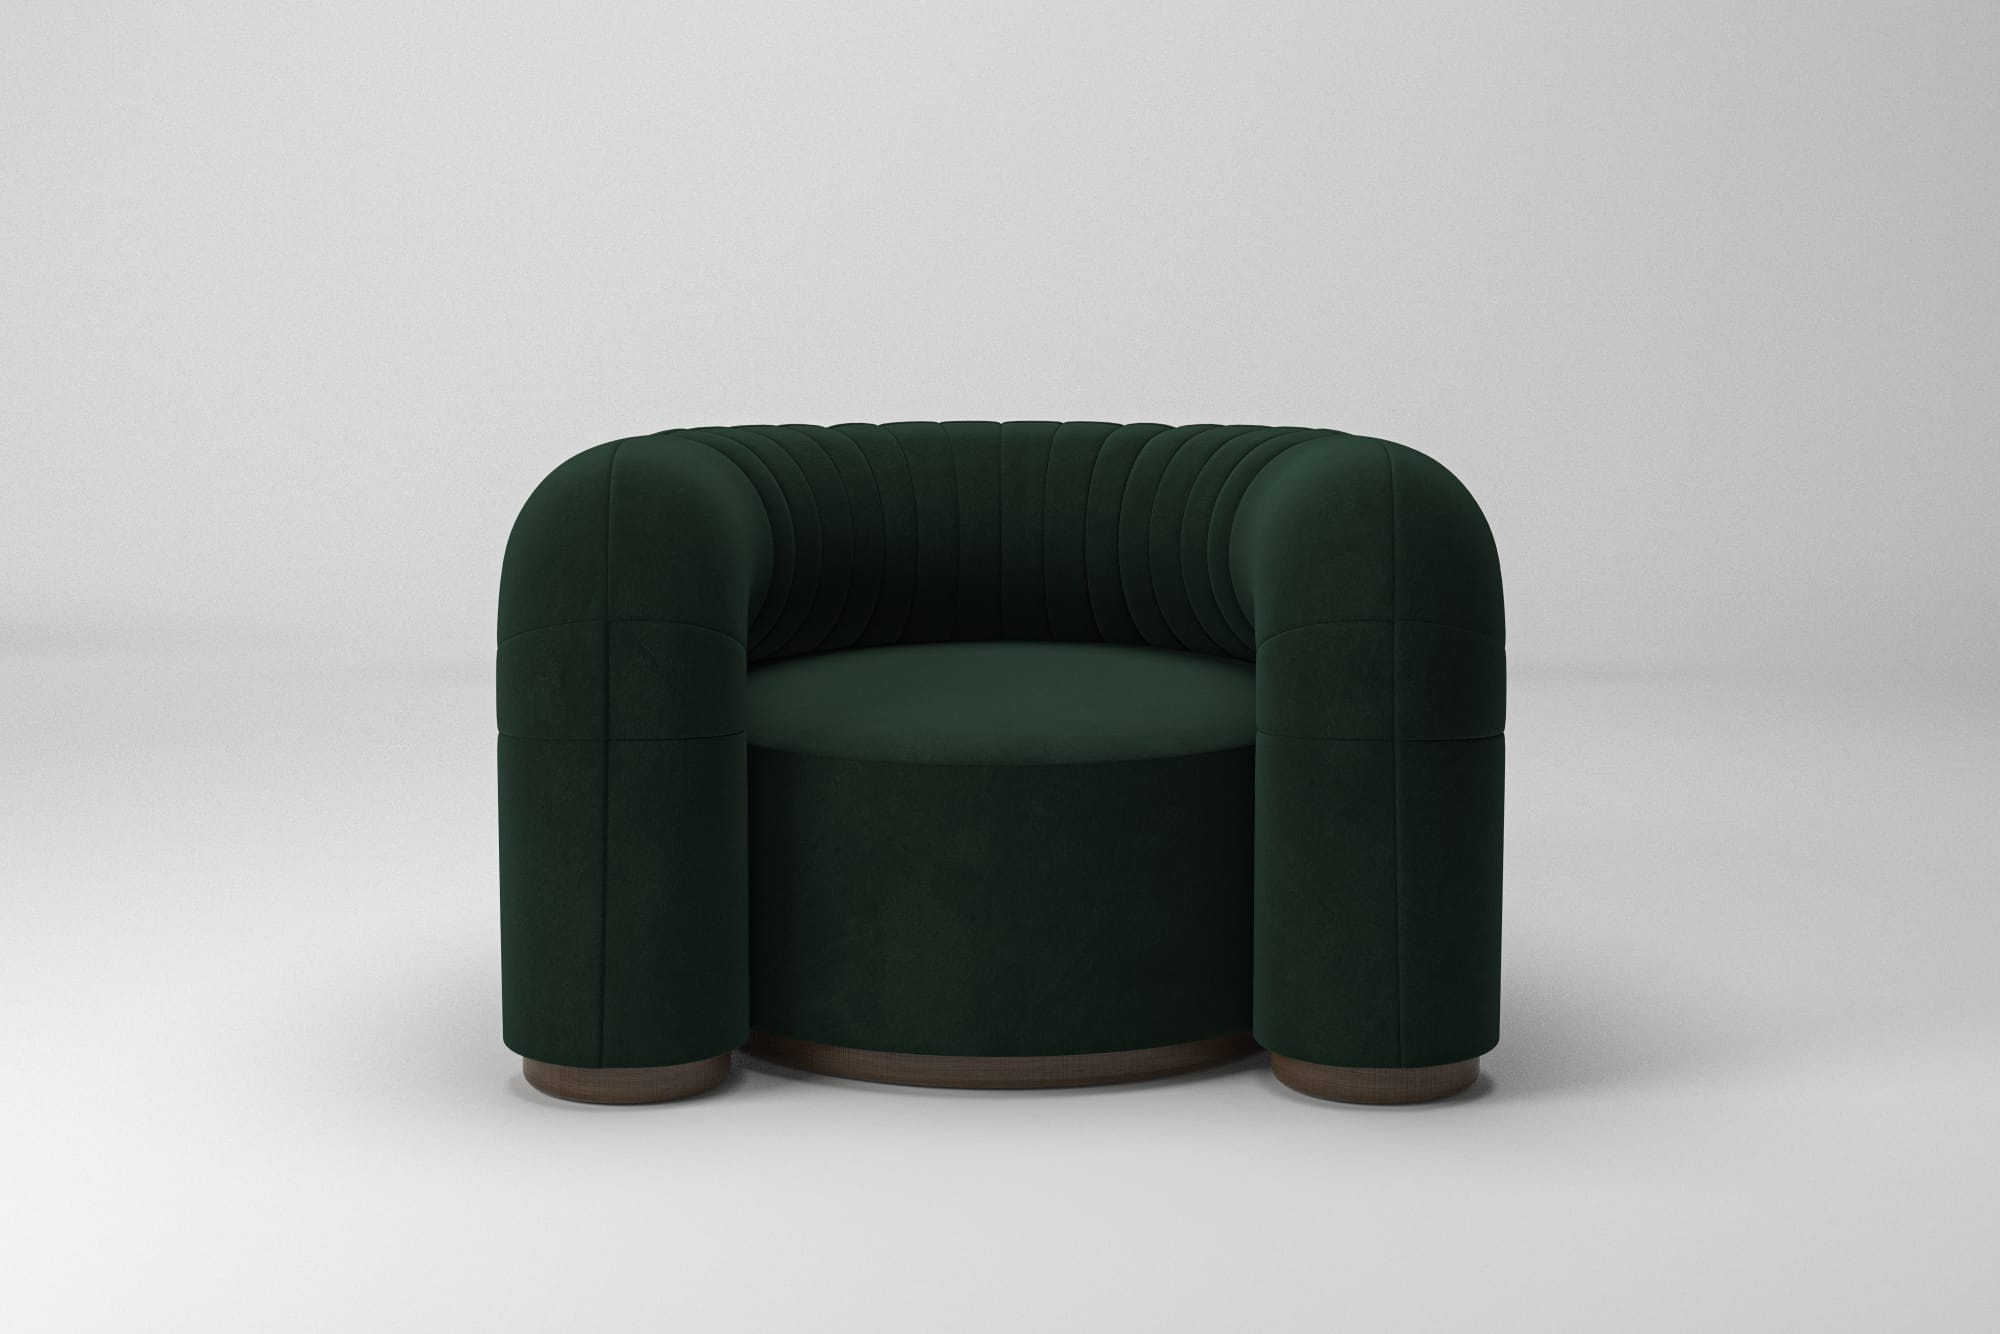 soft round armchair in green